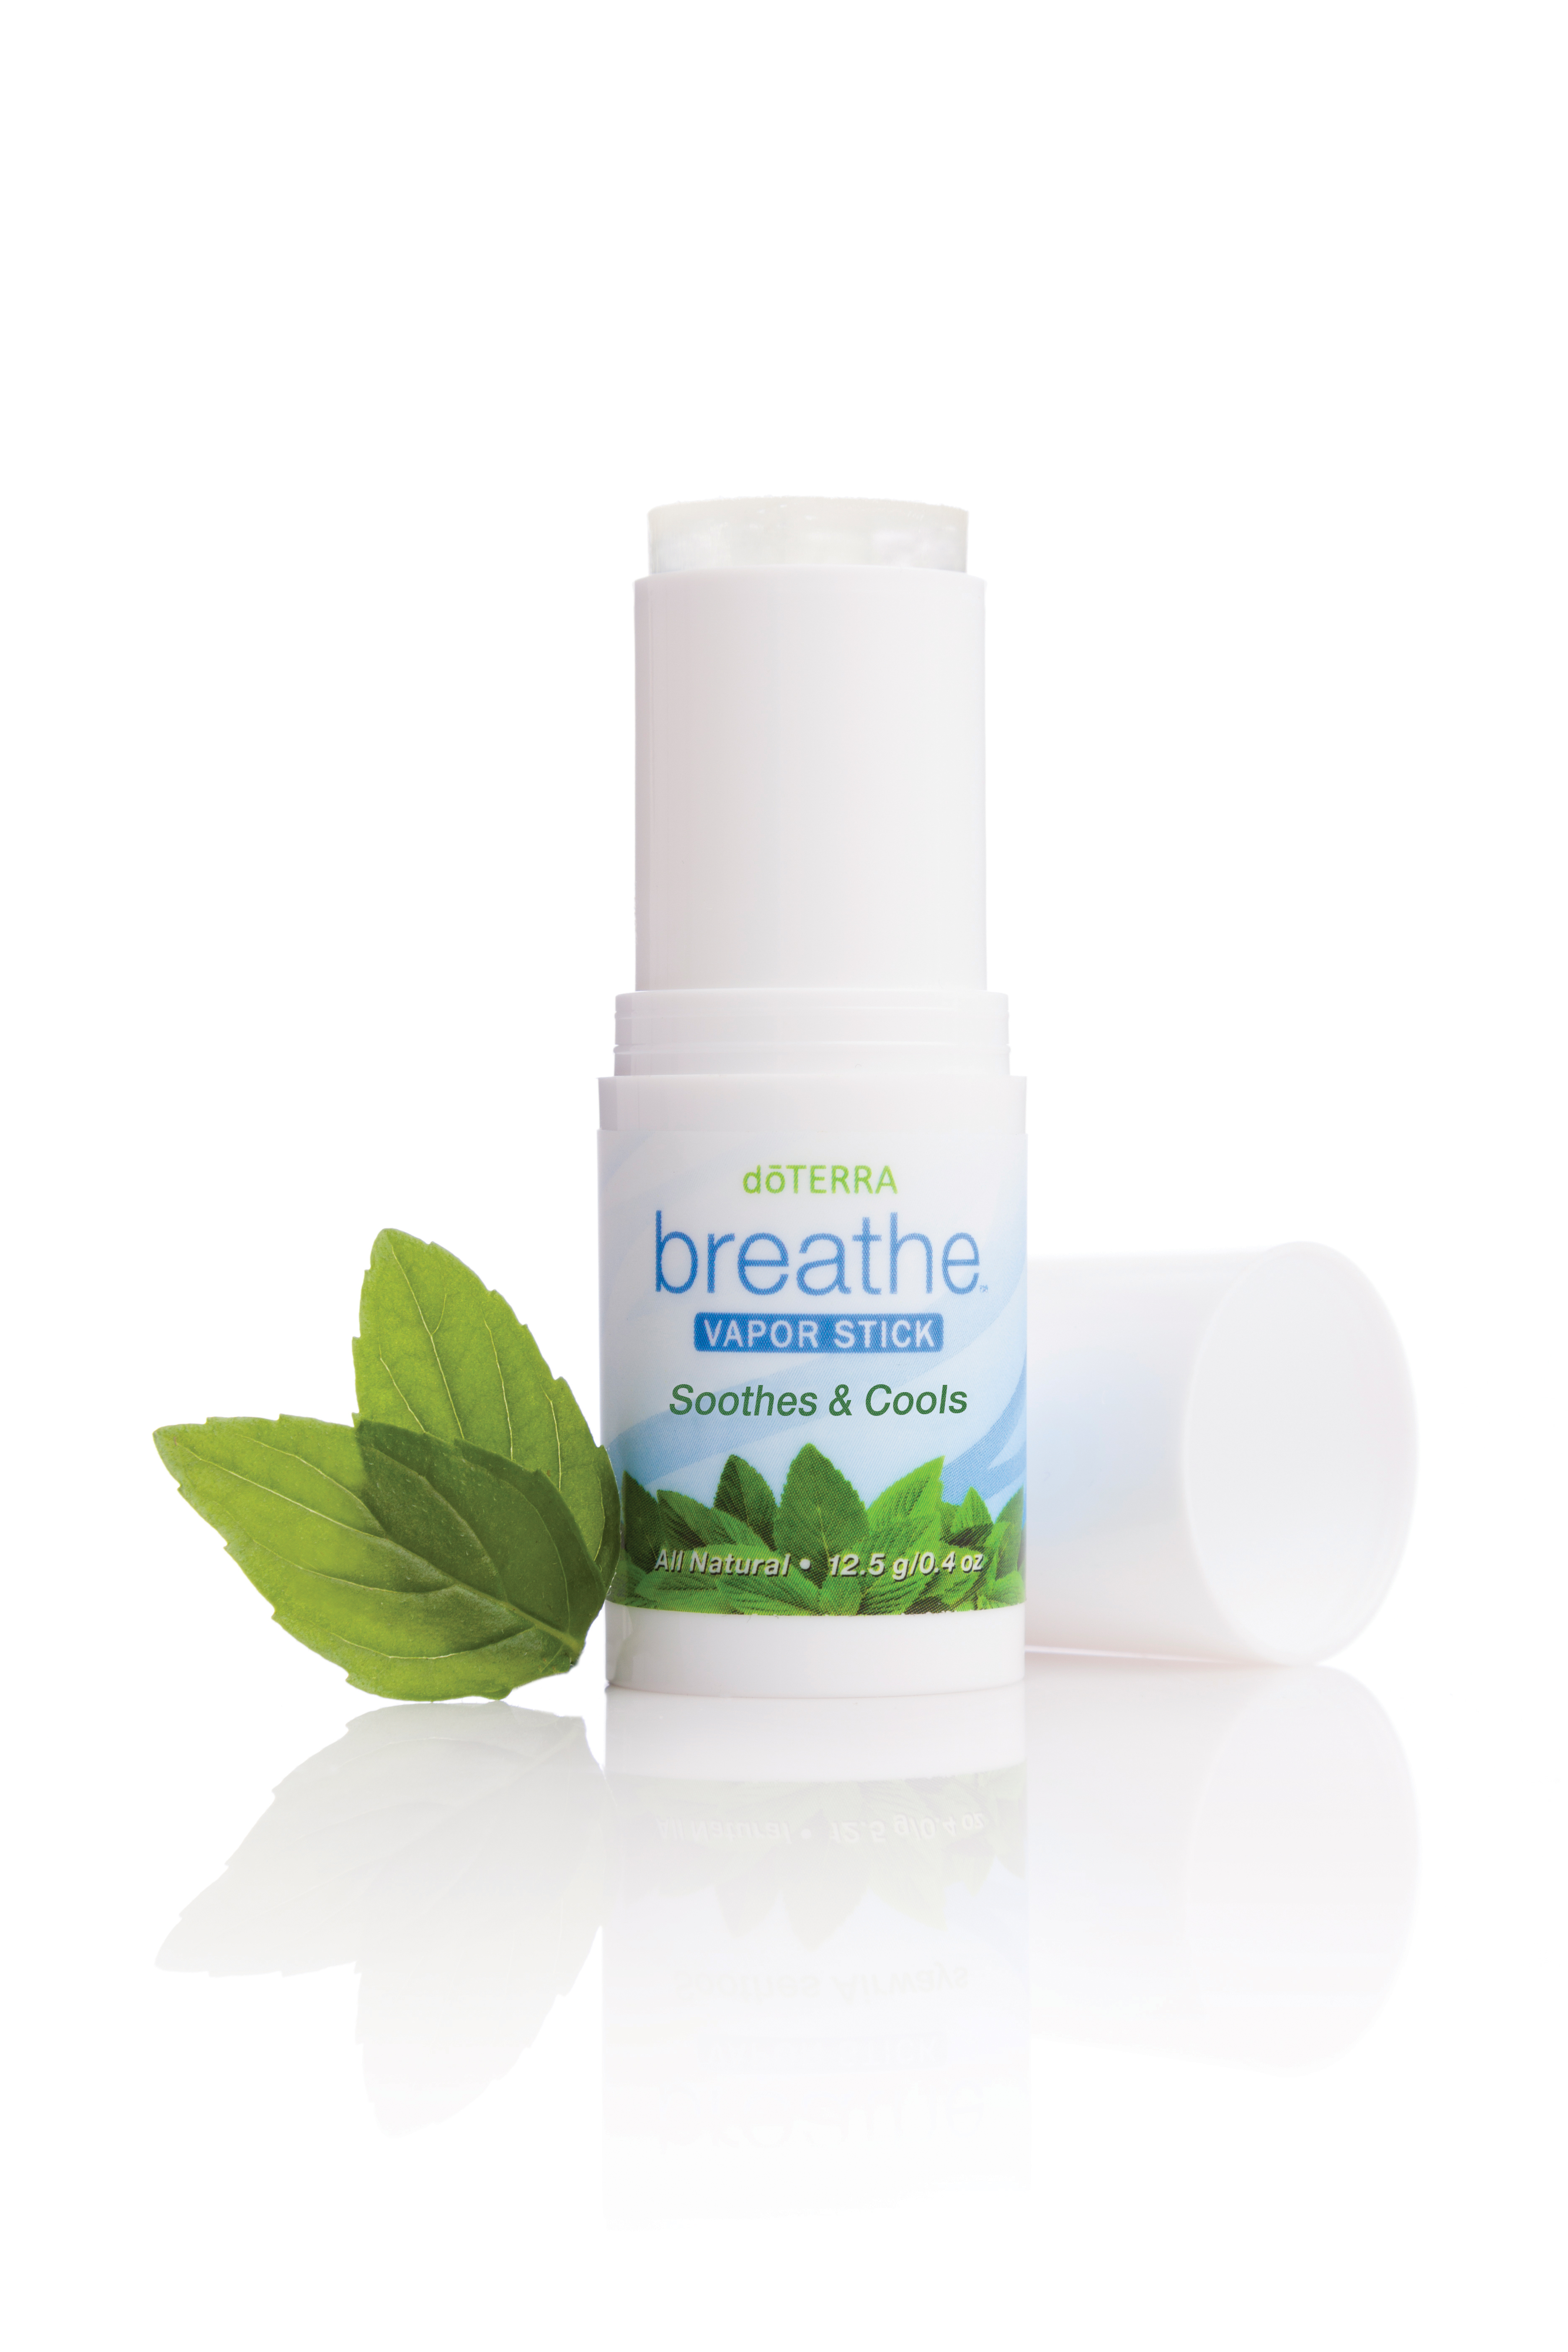 doterra-breathe-vapor-stick.jpg